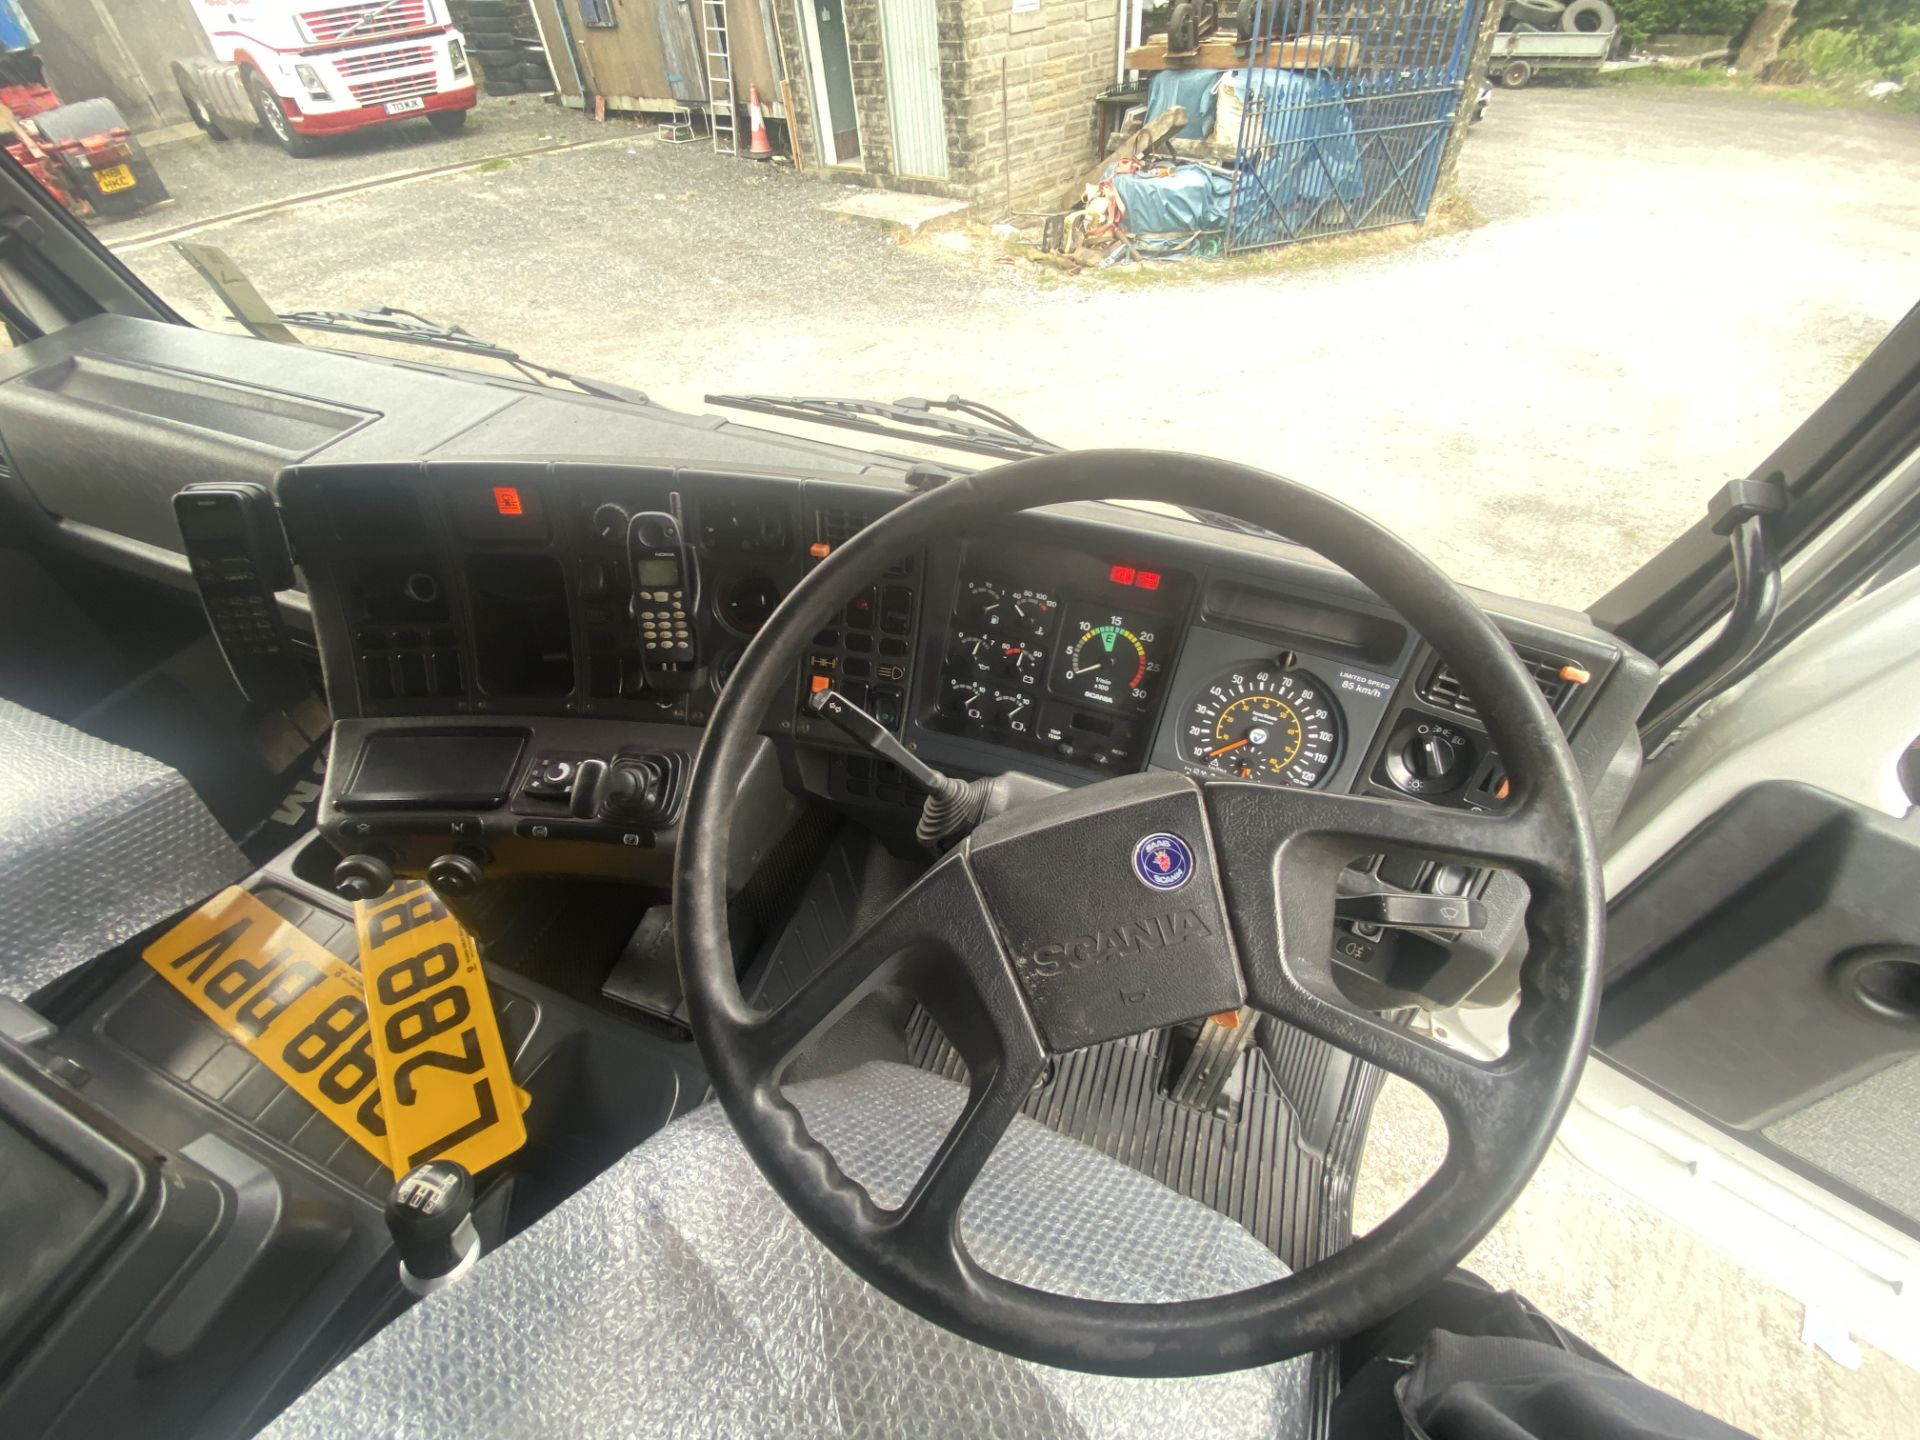 Scania 143M450 V8 4X2 TRACTOR UNIT, registration no. L288 BPV, date first registered 01/08/1993, - Image 17 of 20